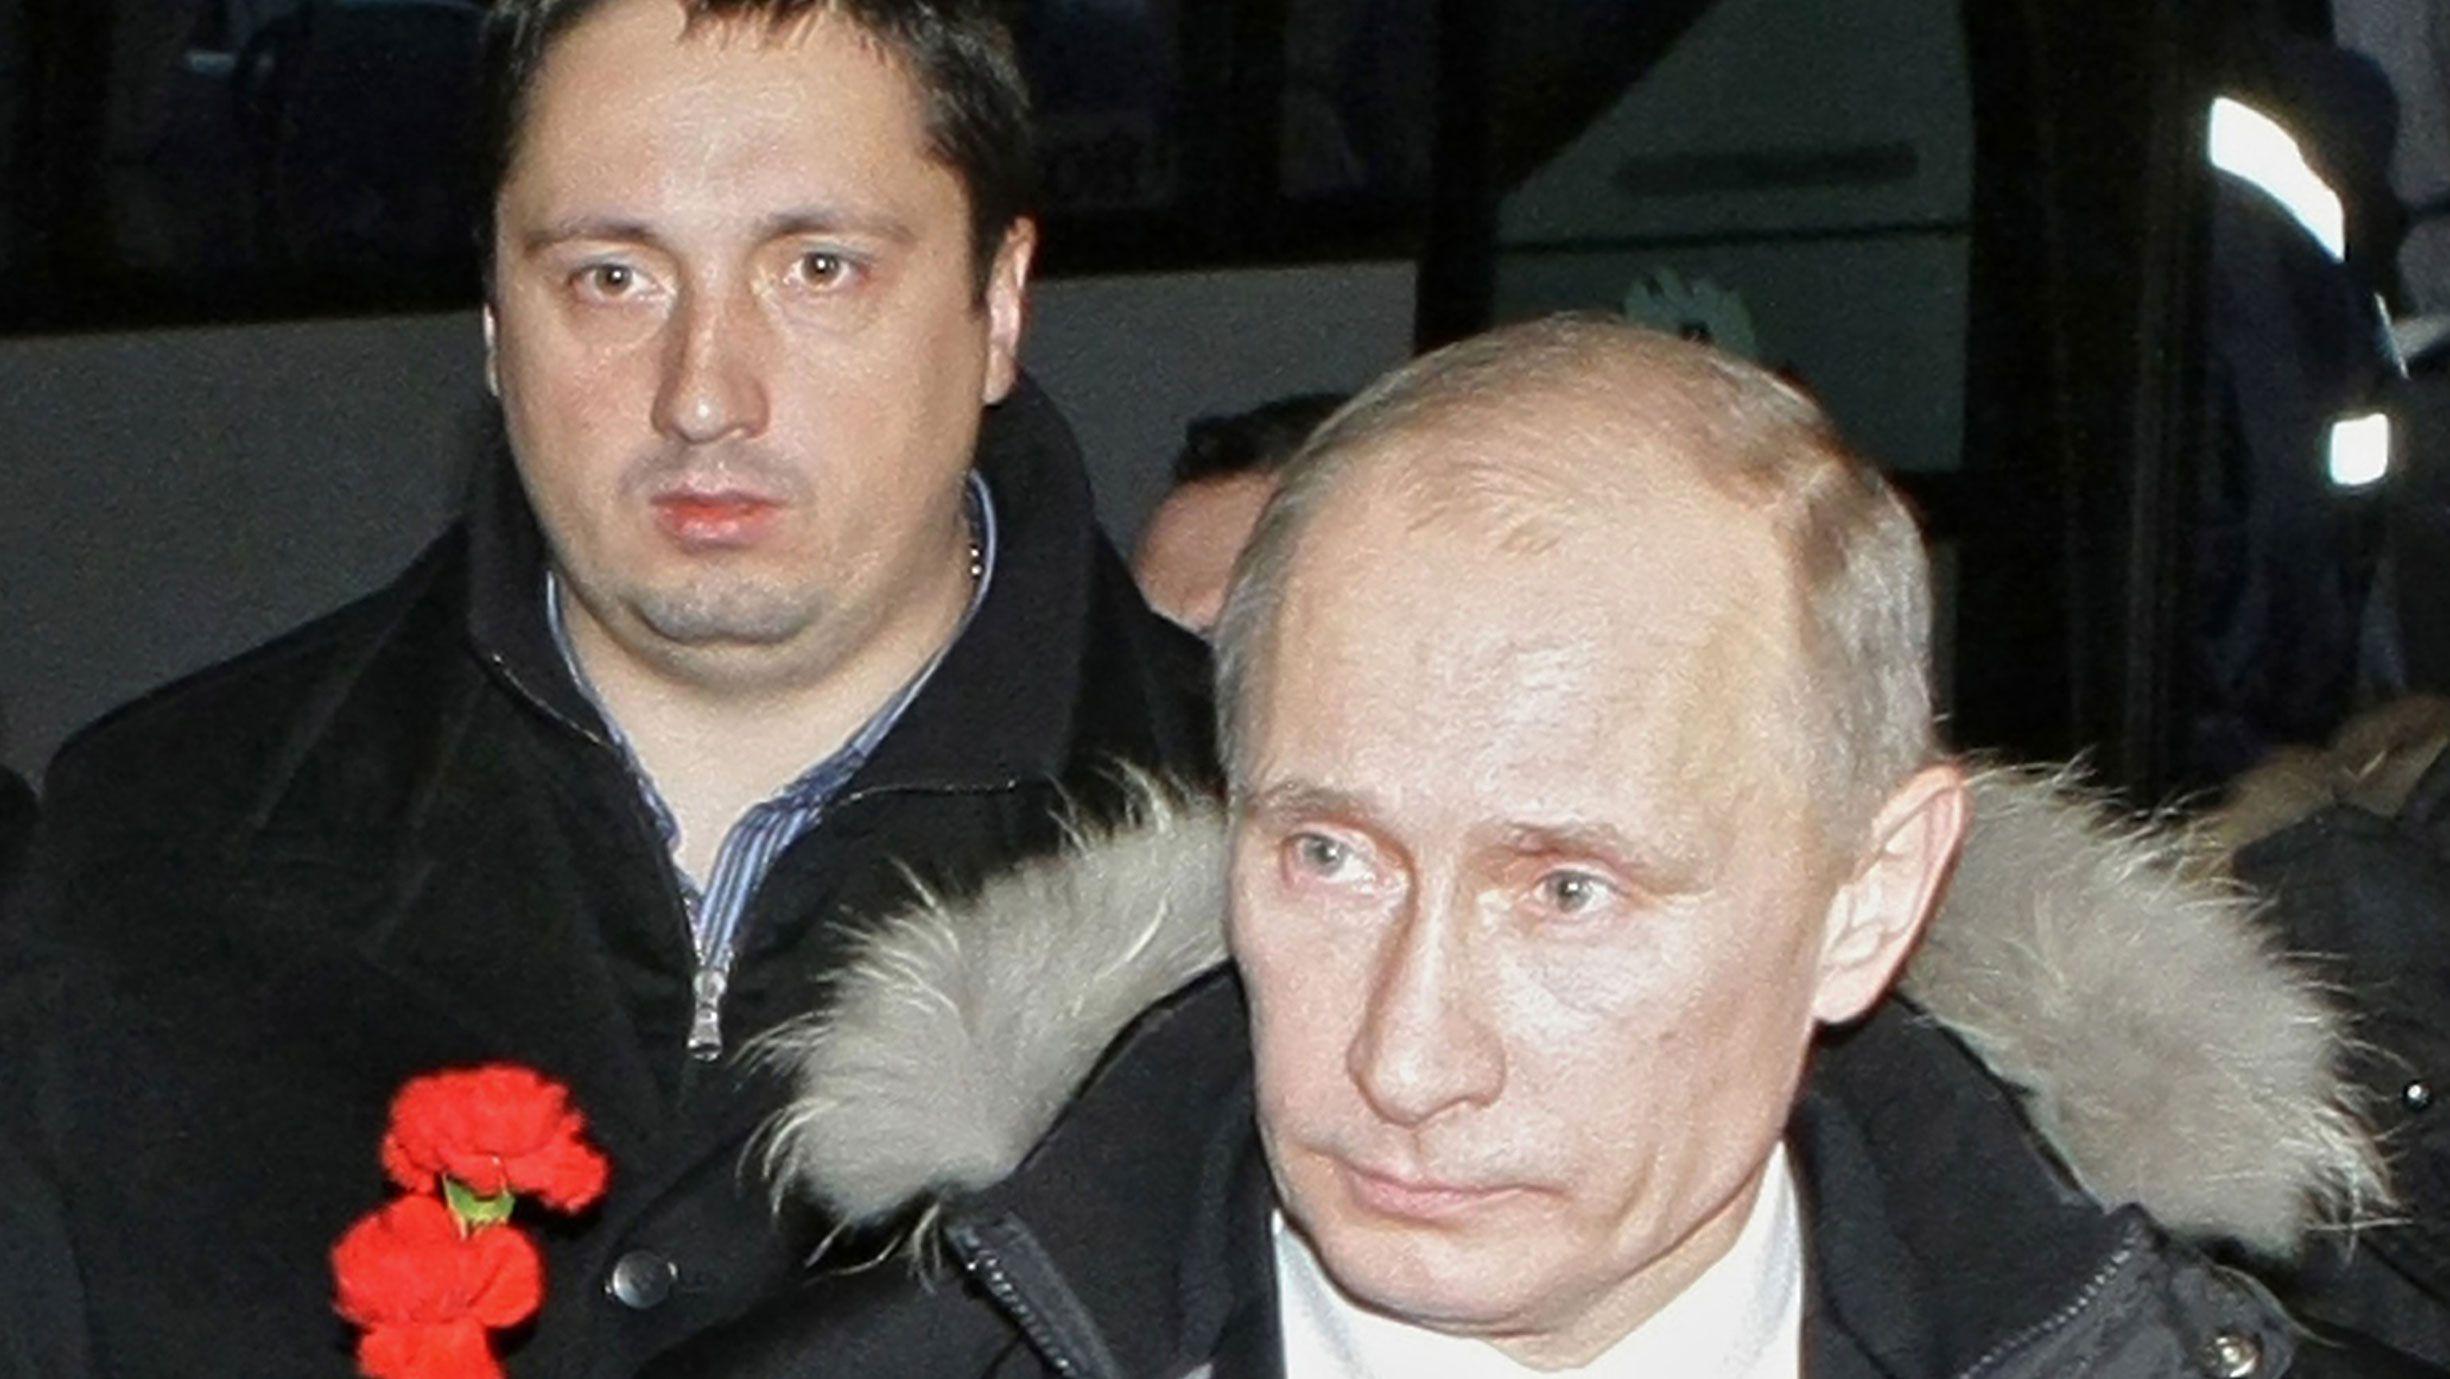 Chief Russian hooligan 'an ultra nationalist'